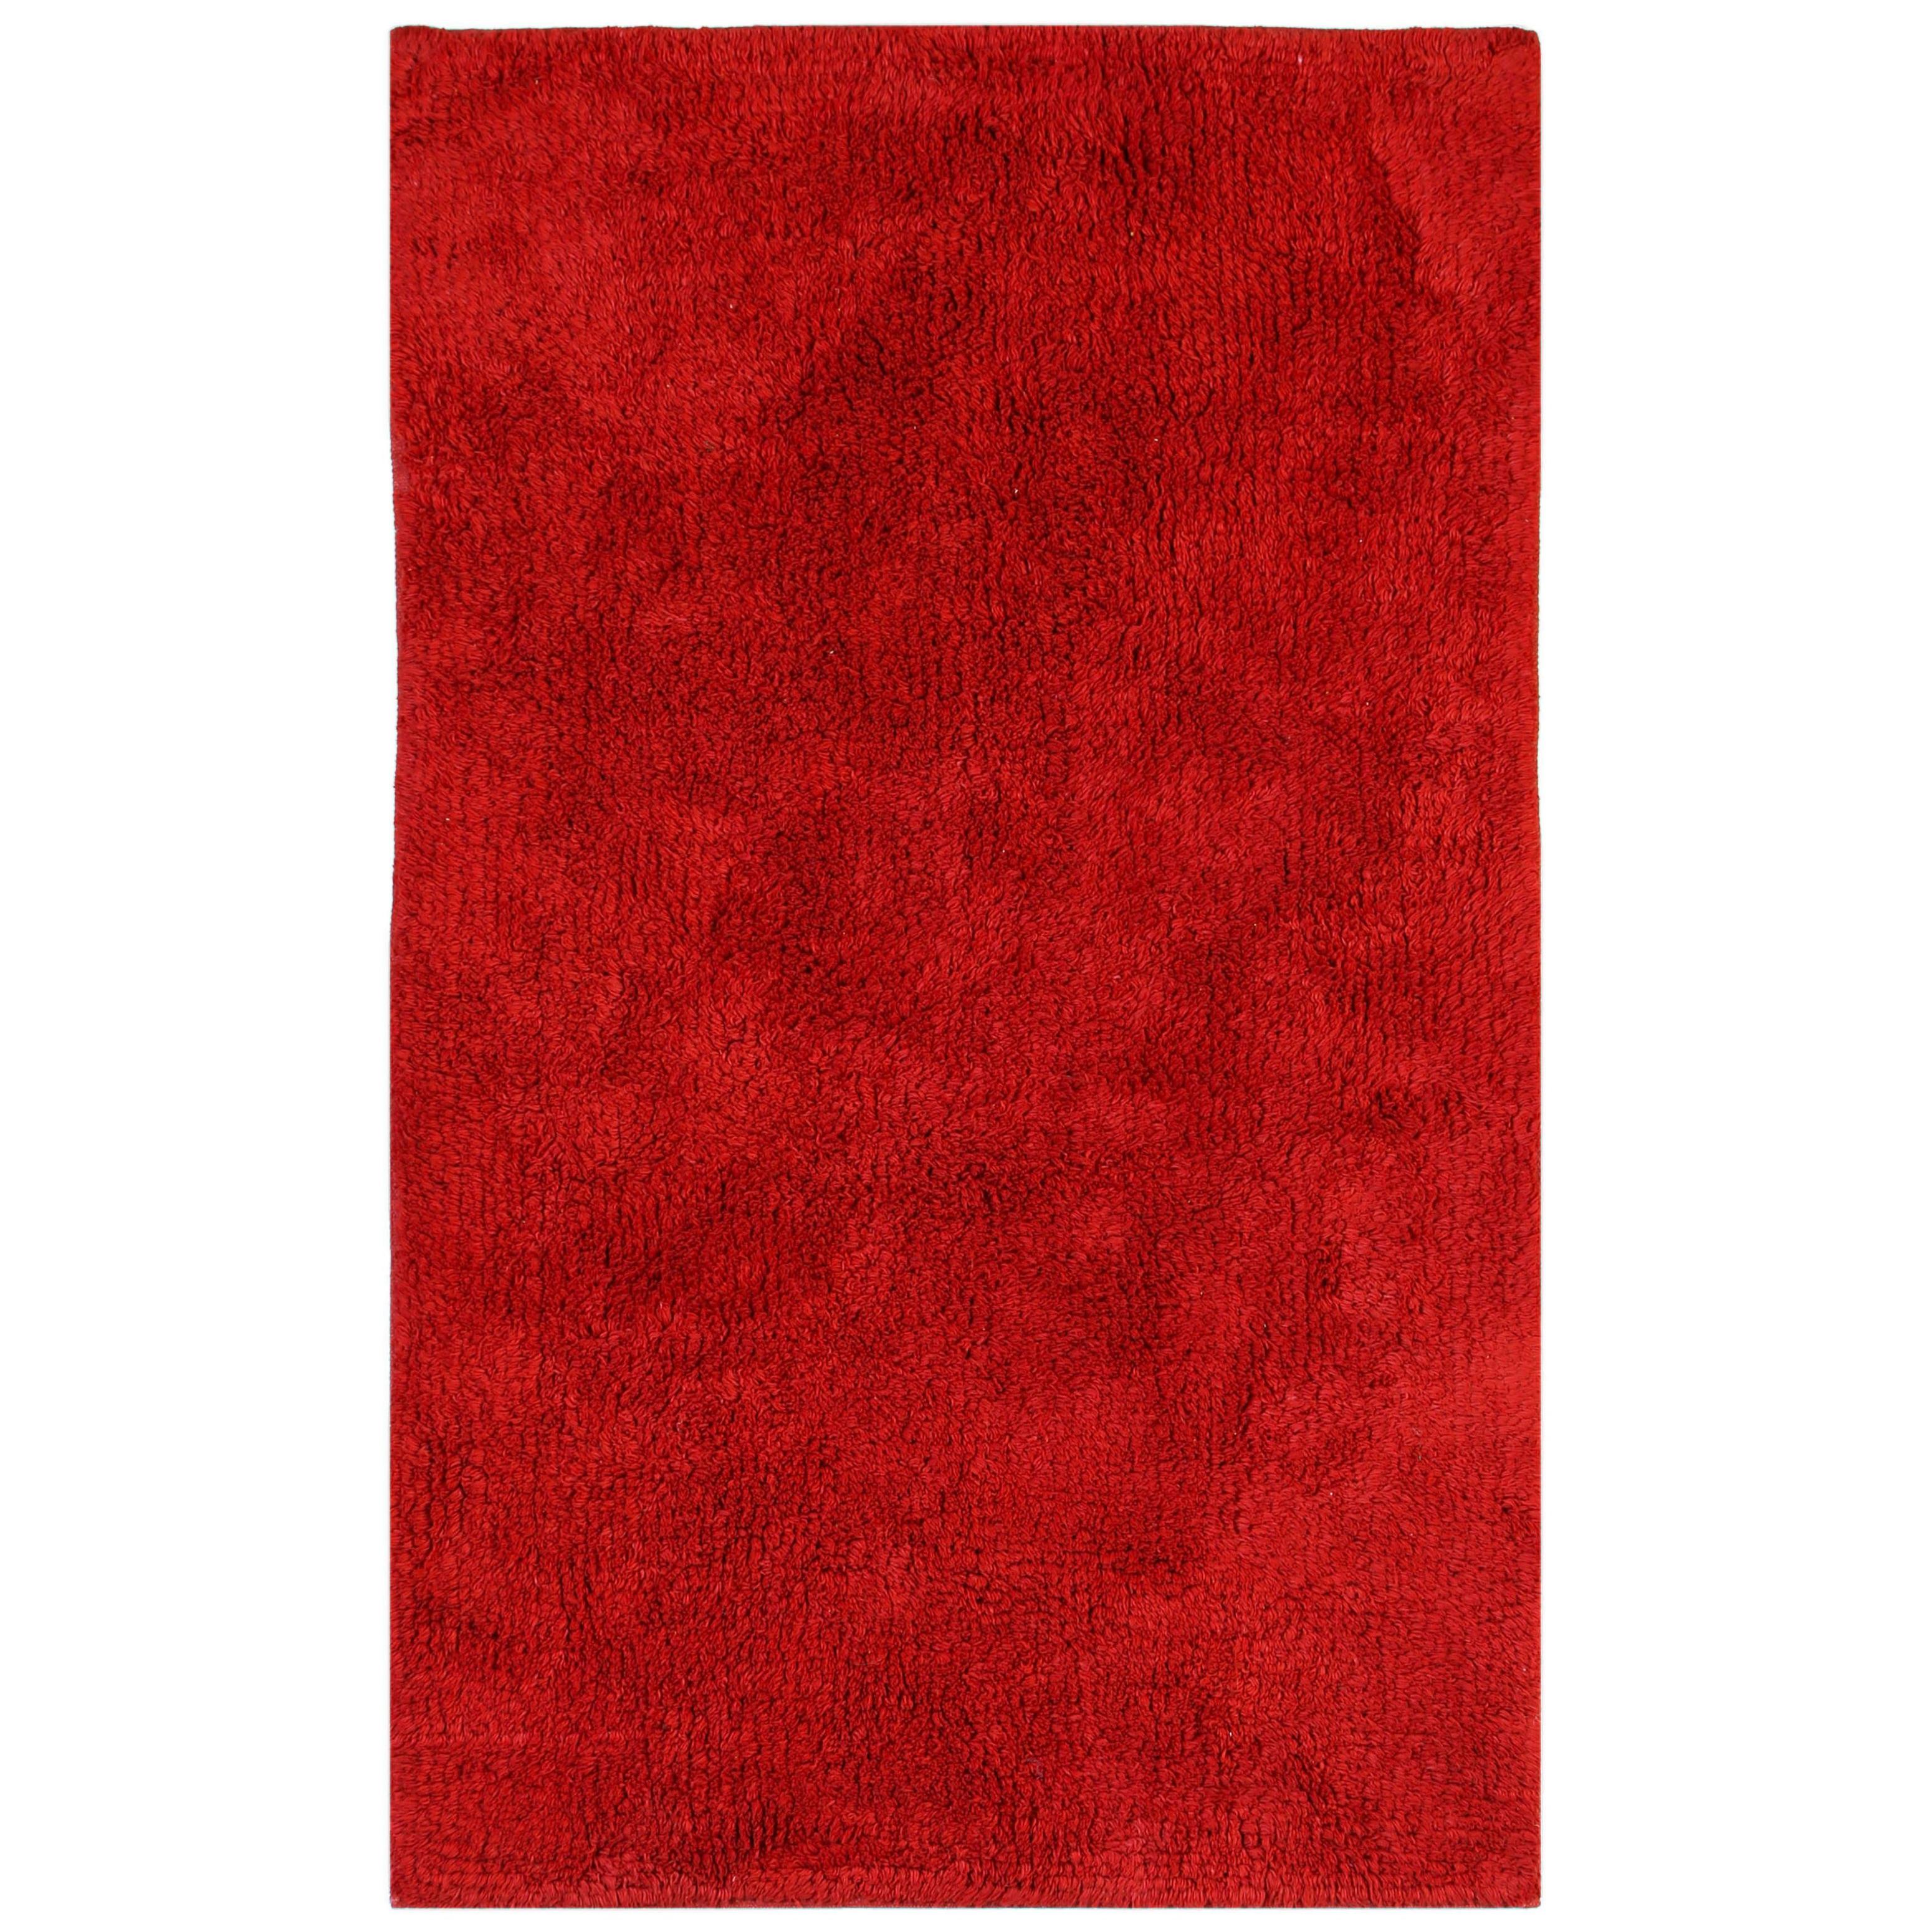 "St. Croix Plush Pile Red 30""x50"" Bath Rug (Plush Pile Red..."